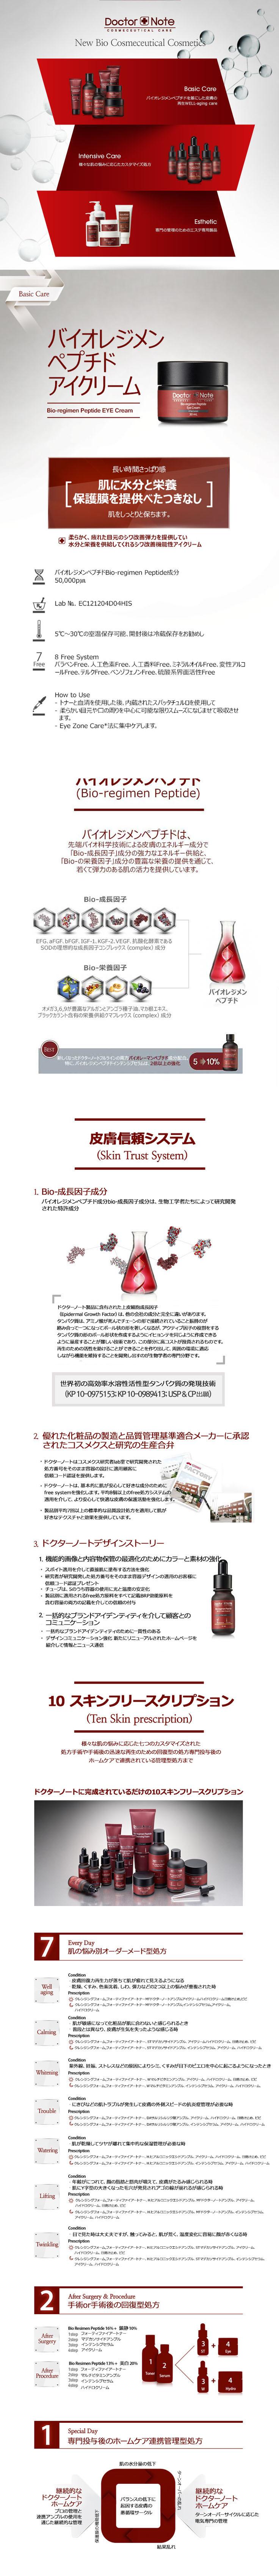 info_DRN005